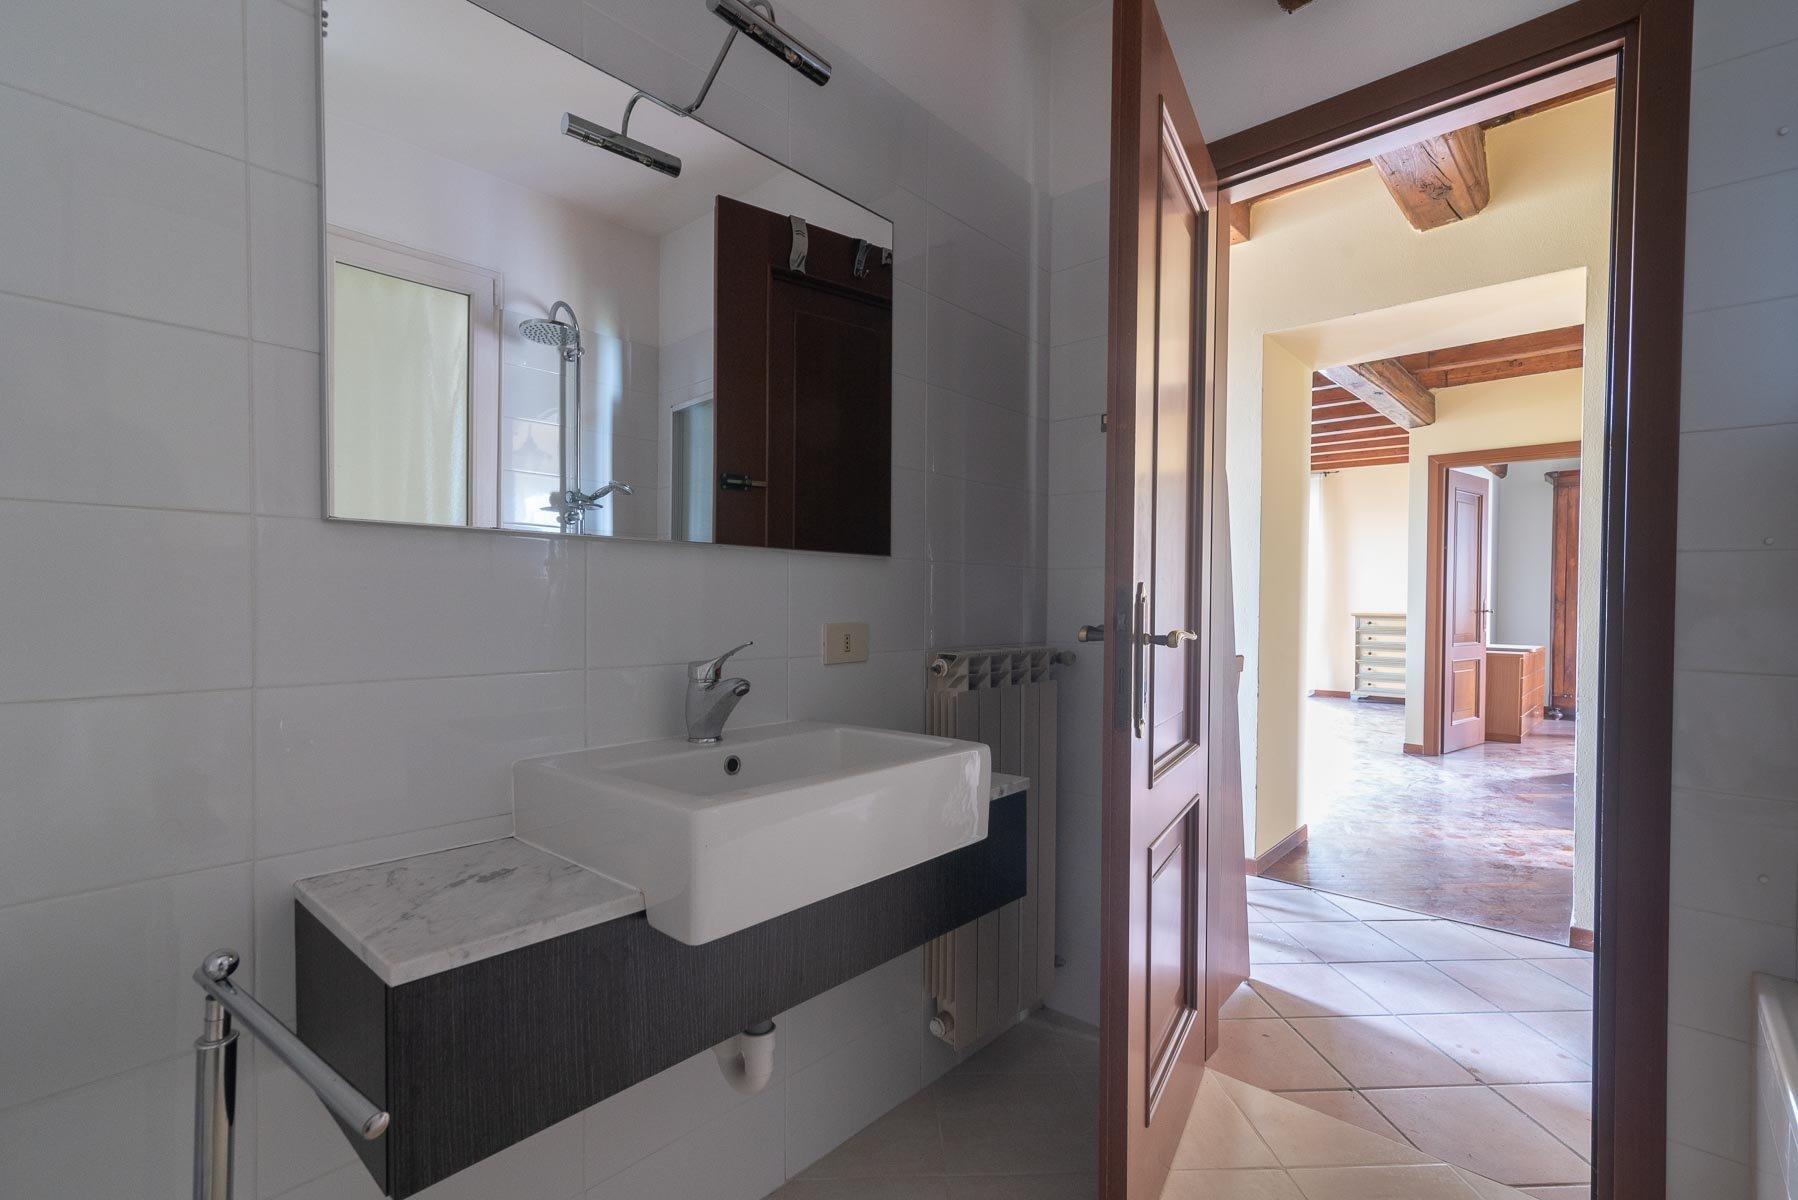 Apartment for sale in Pescatori Island, Stresa - bathroom